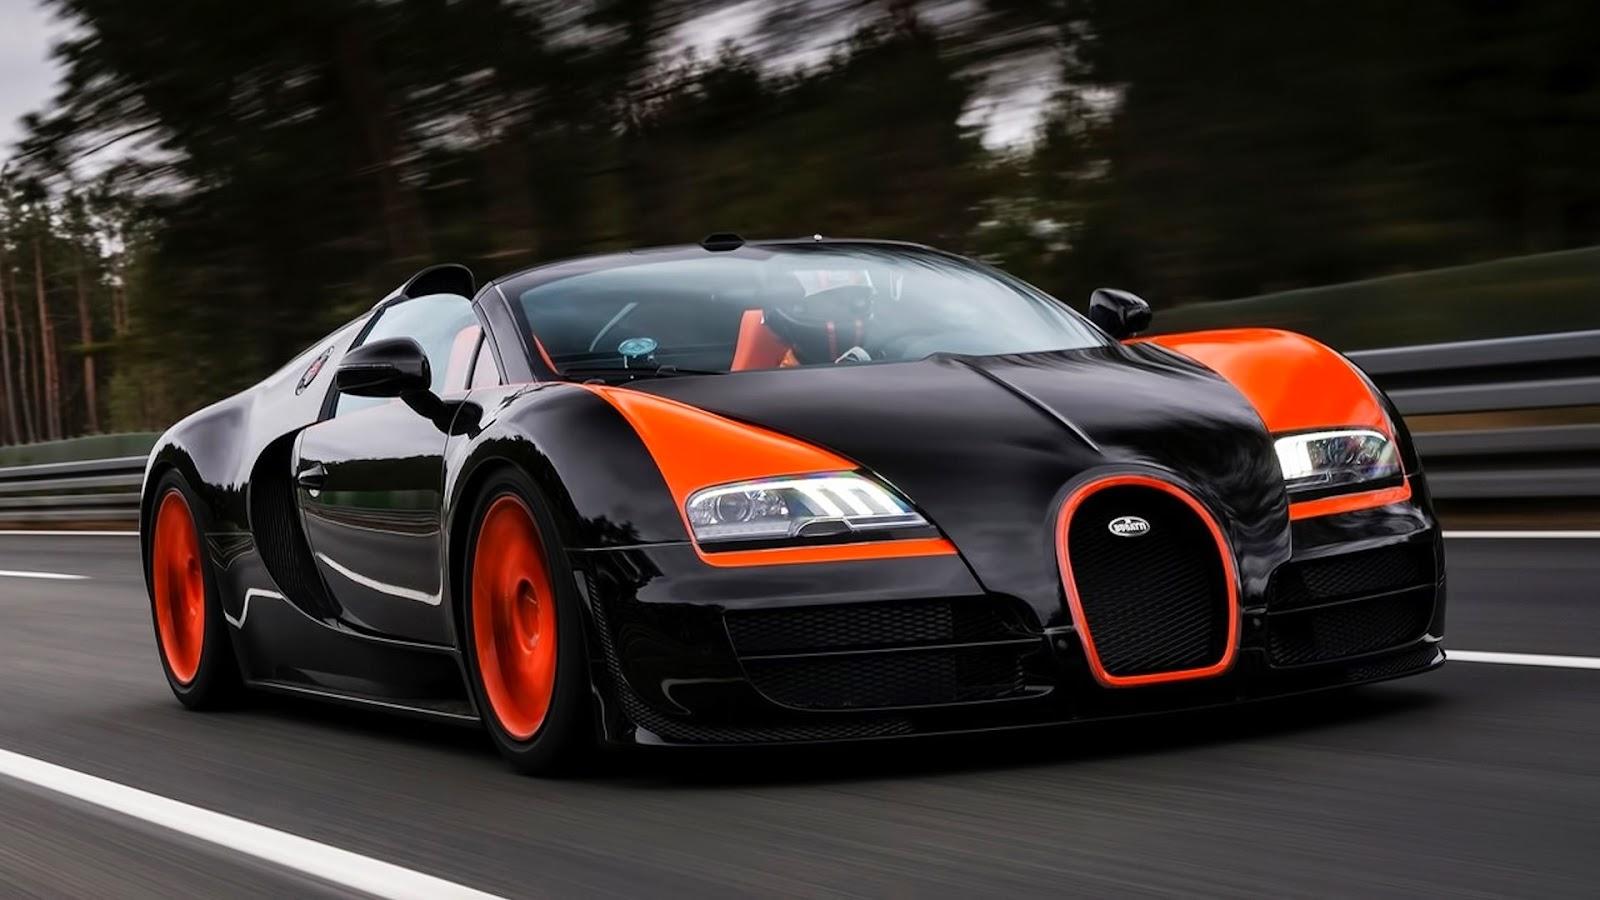 Bugatti Veyron Orange Full Hd Wallpaper Galery Car Wallpaper